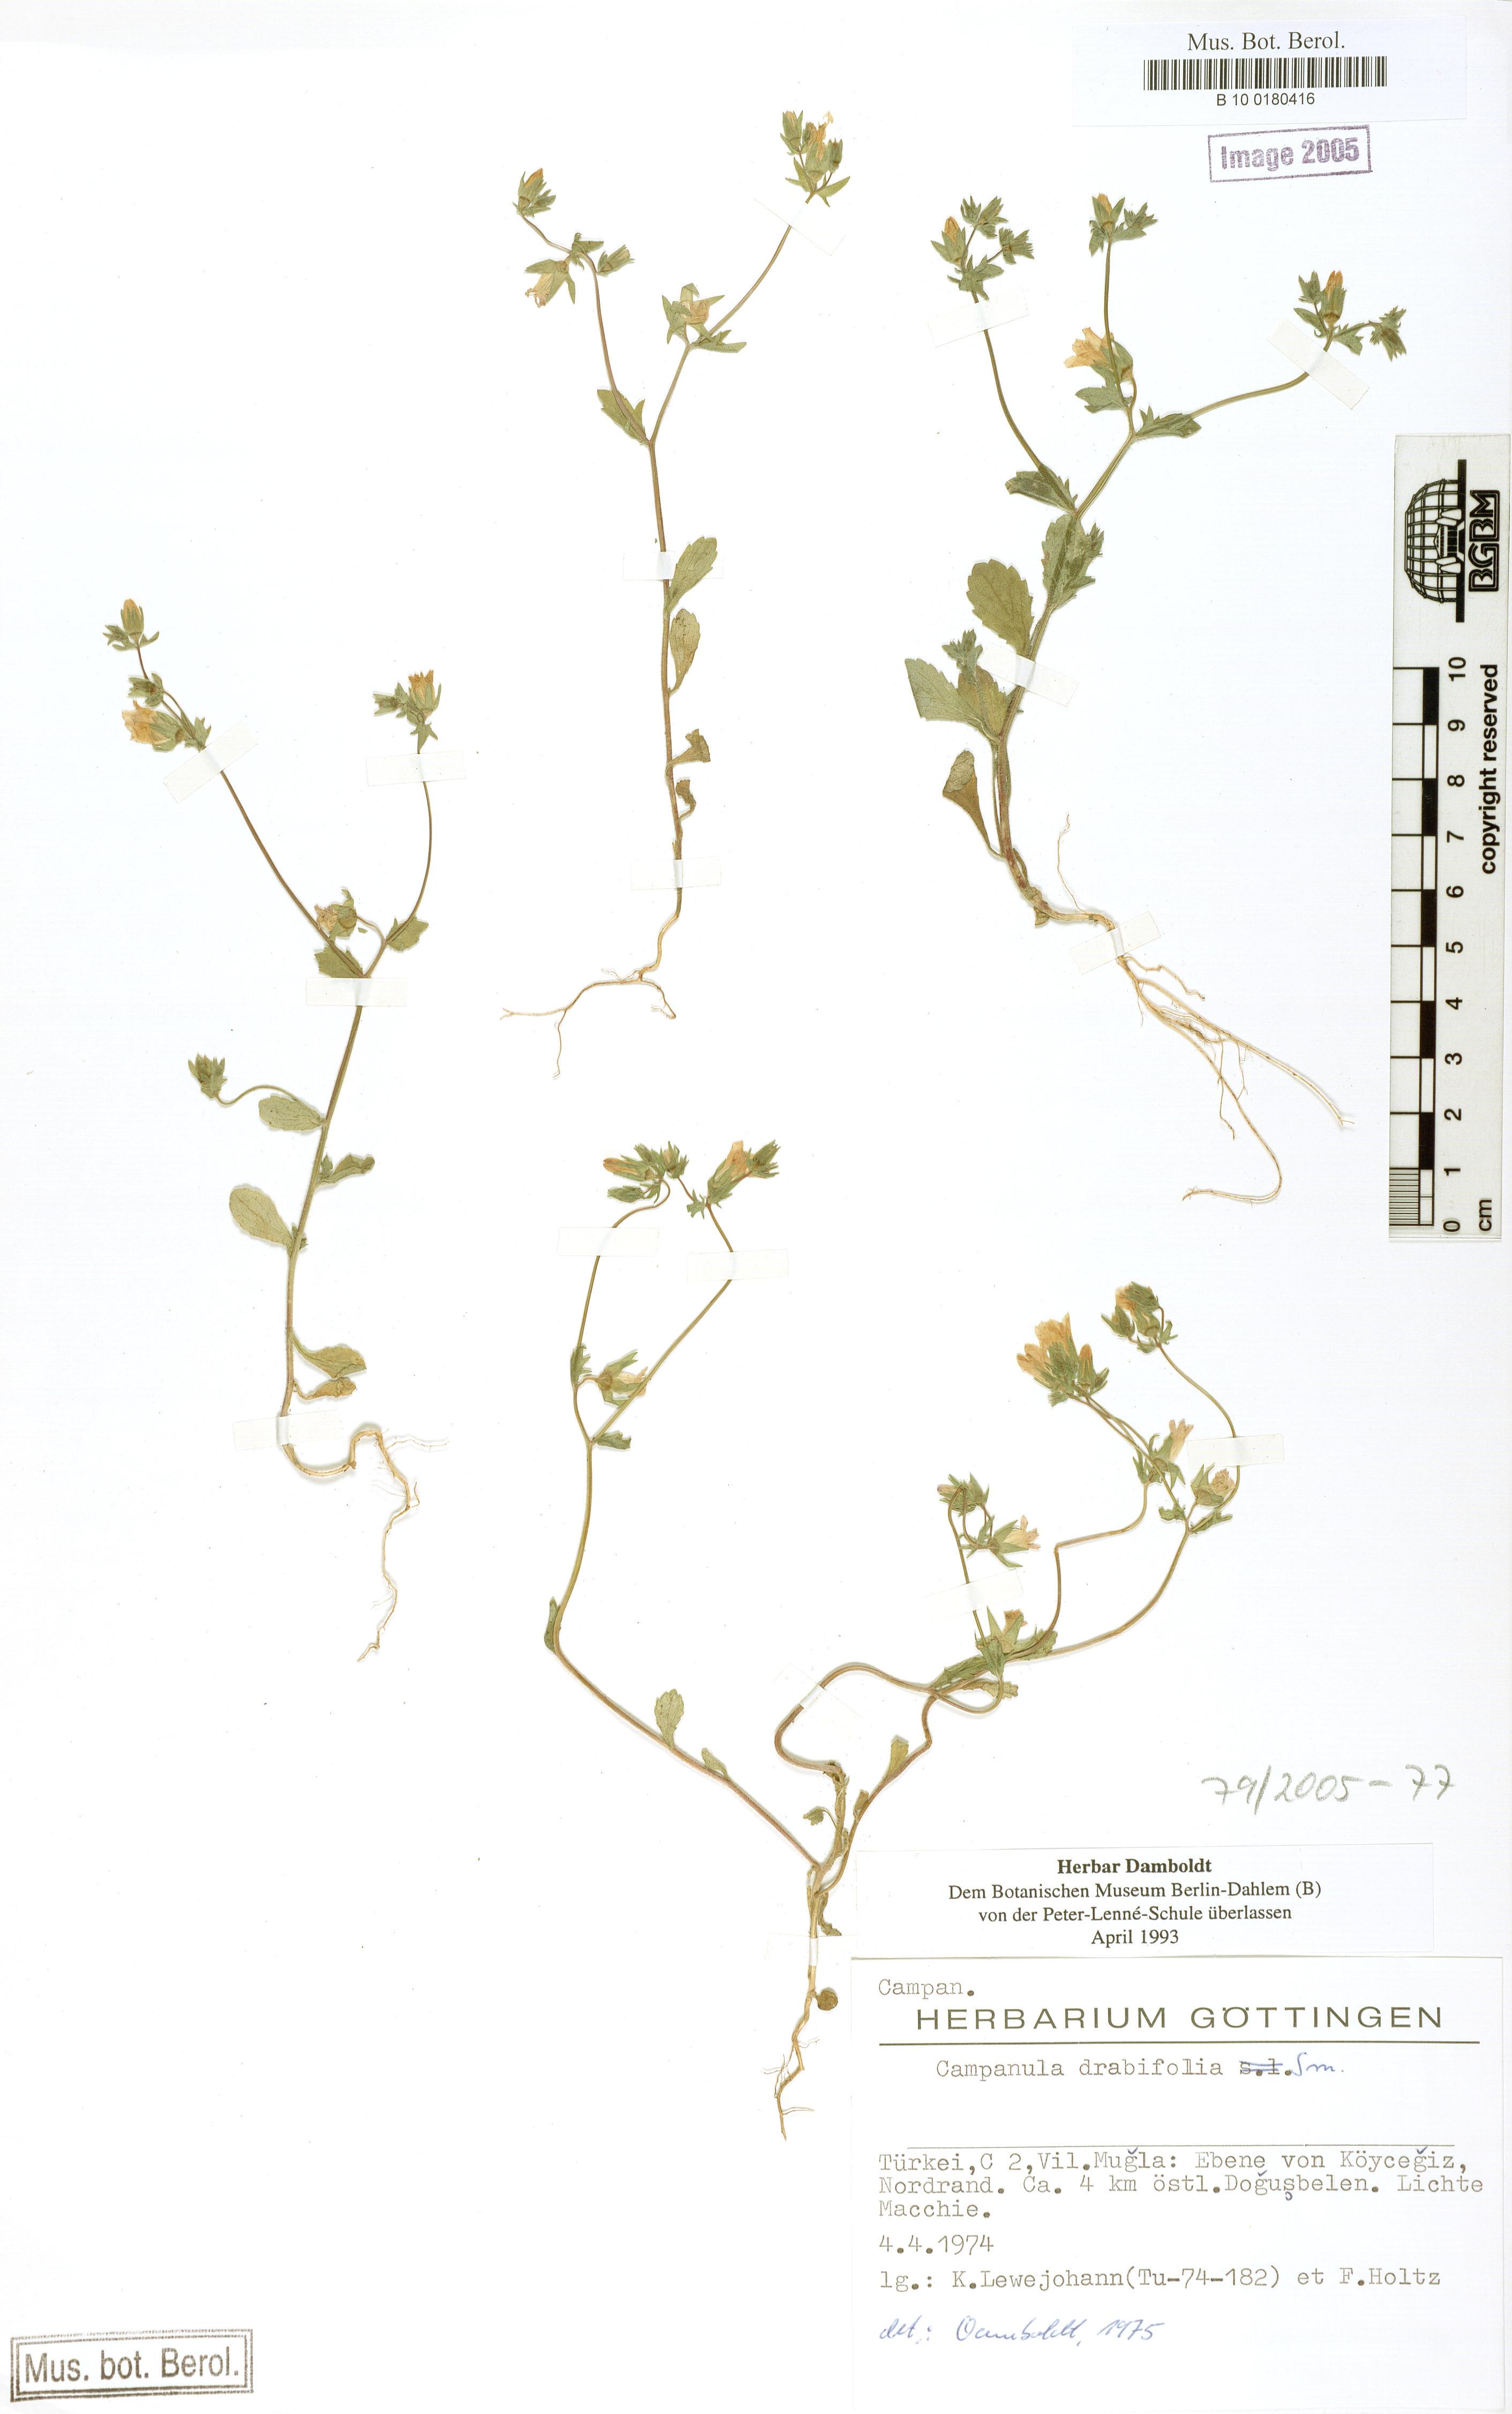 http://ww2.bgbm.org/herbarium/images/B/10/01/80/41/B_10_0180416.jpg